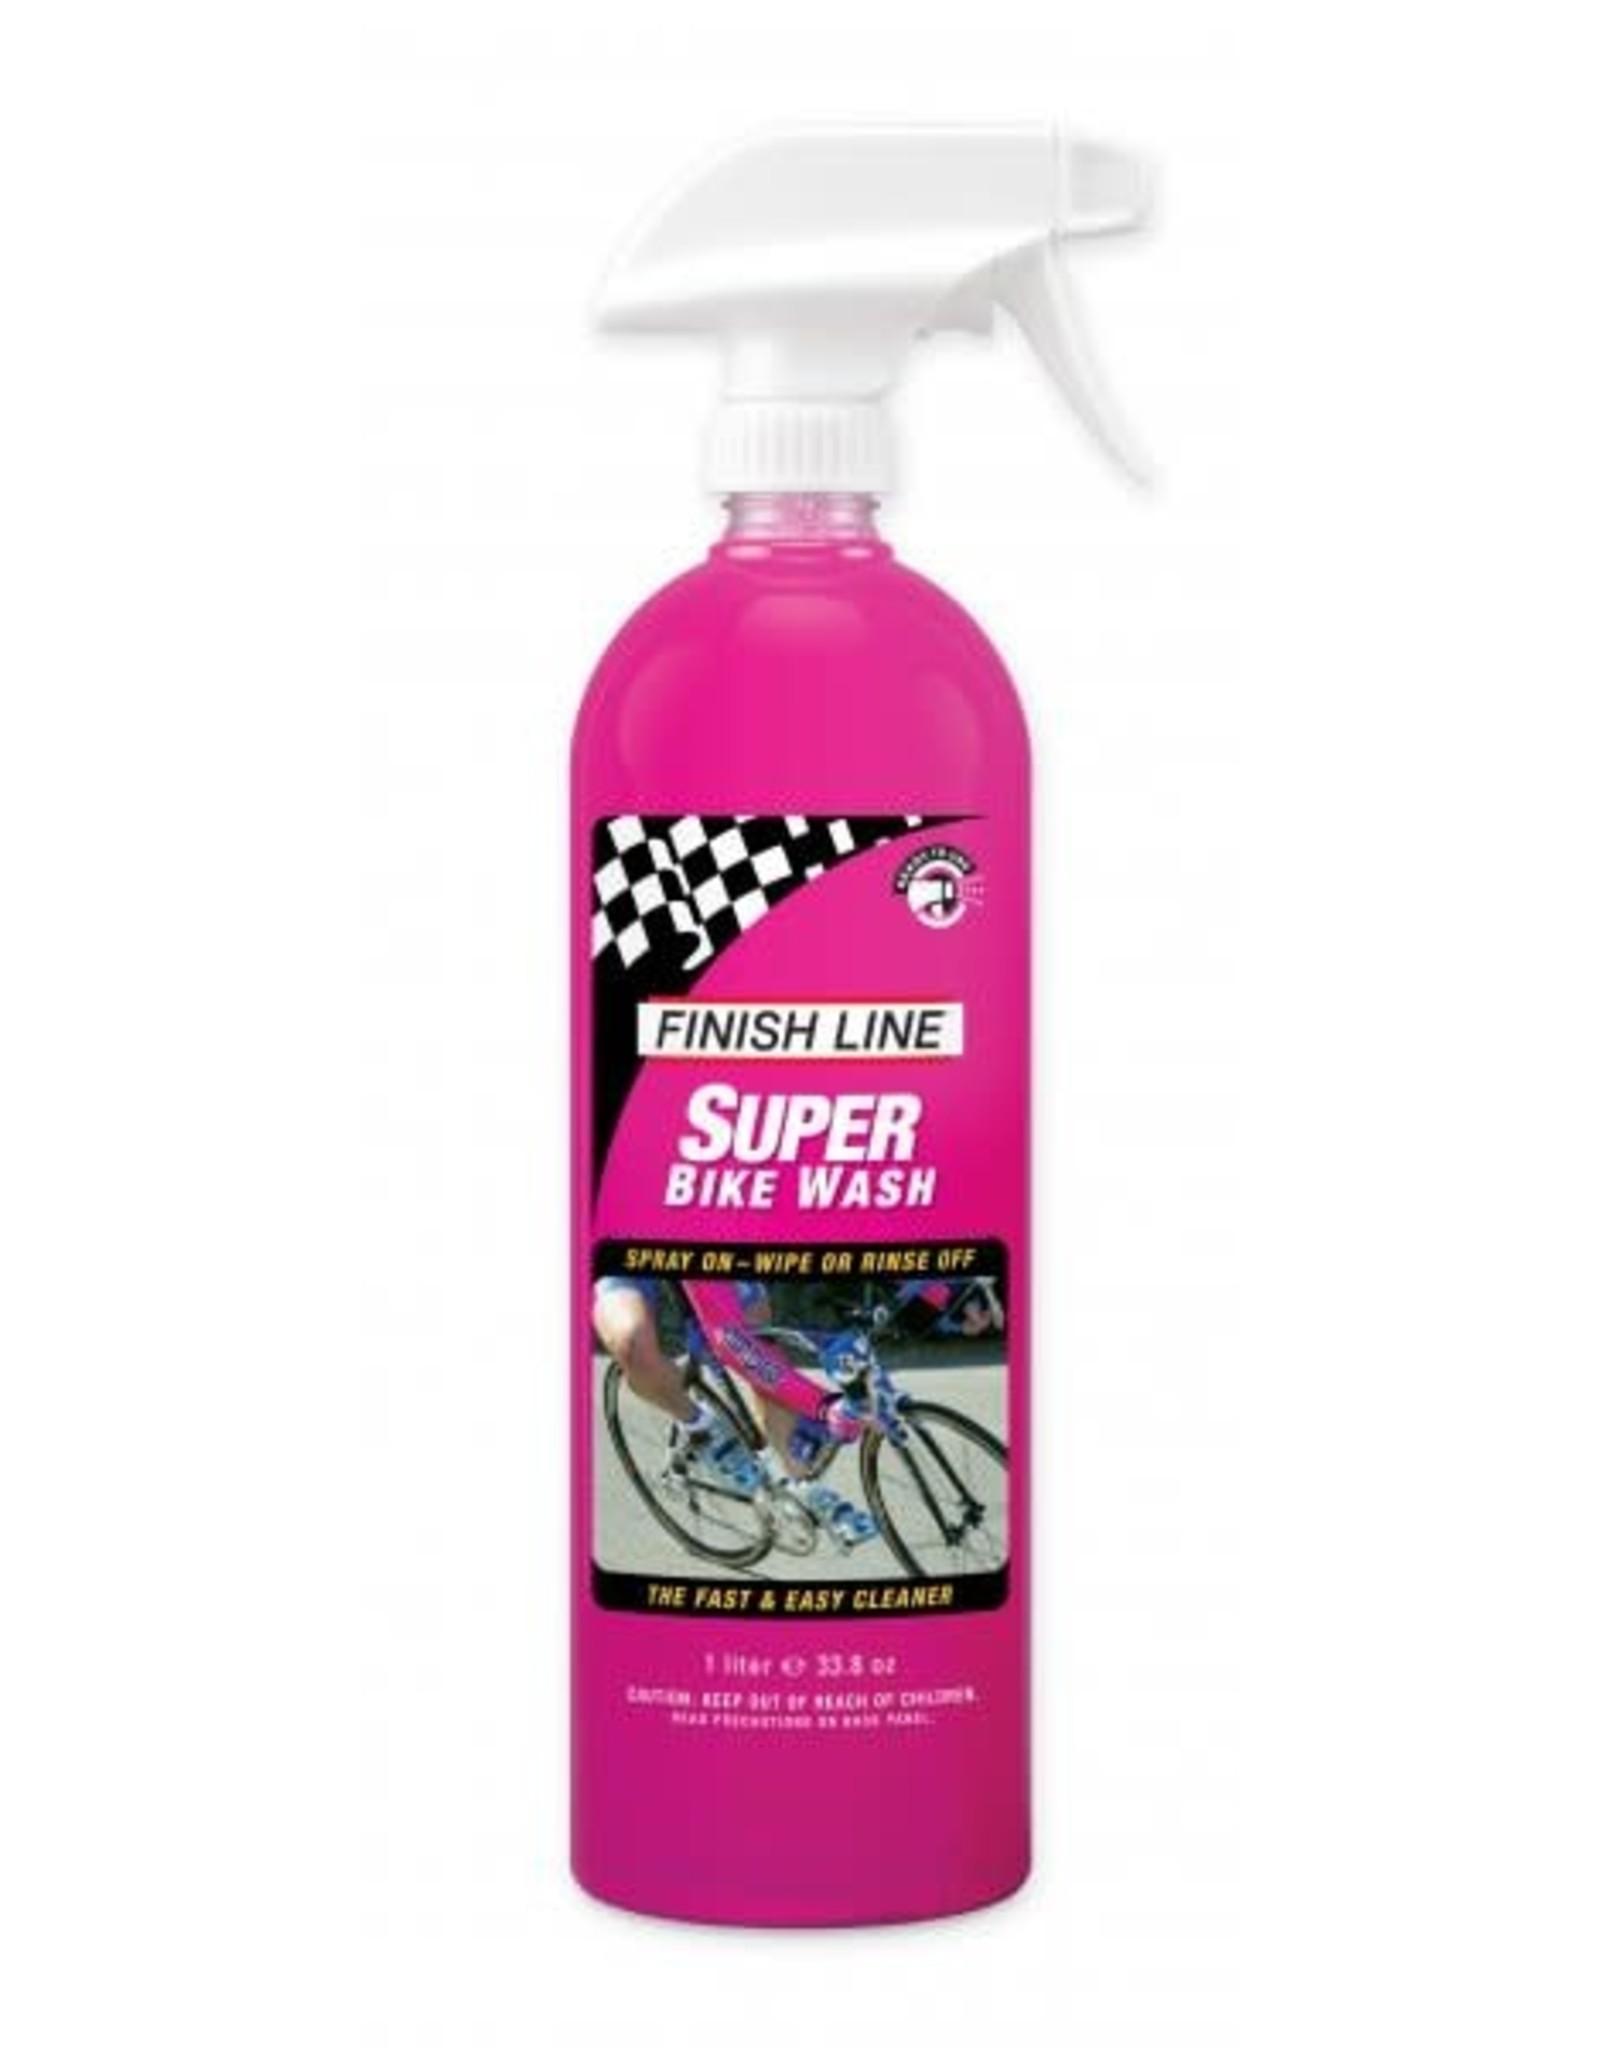 Finish Line Finish Line Super Bike Wash Cleaner 33oz 1L